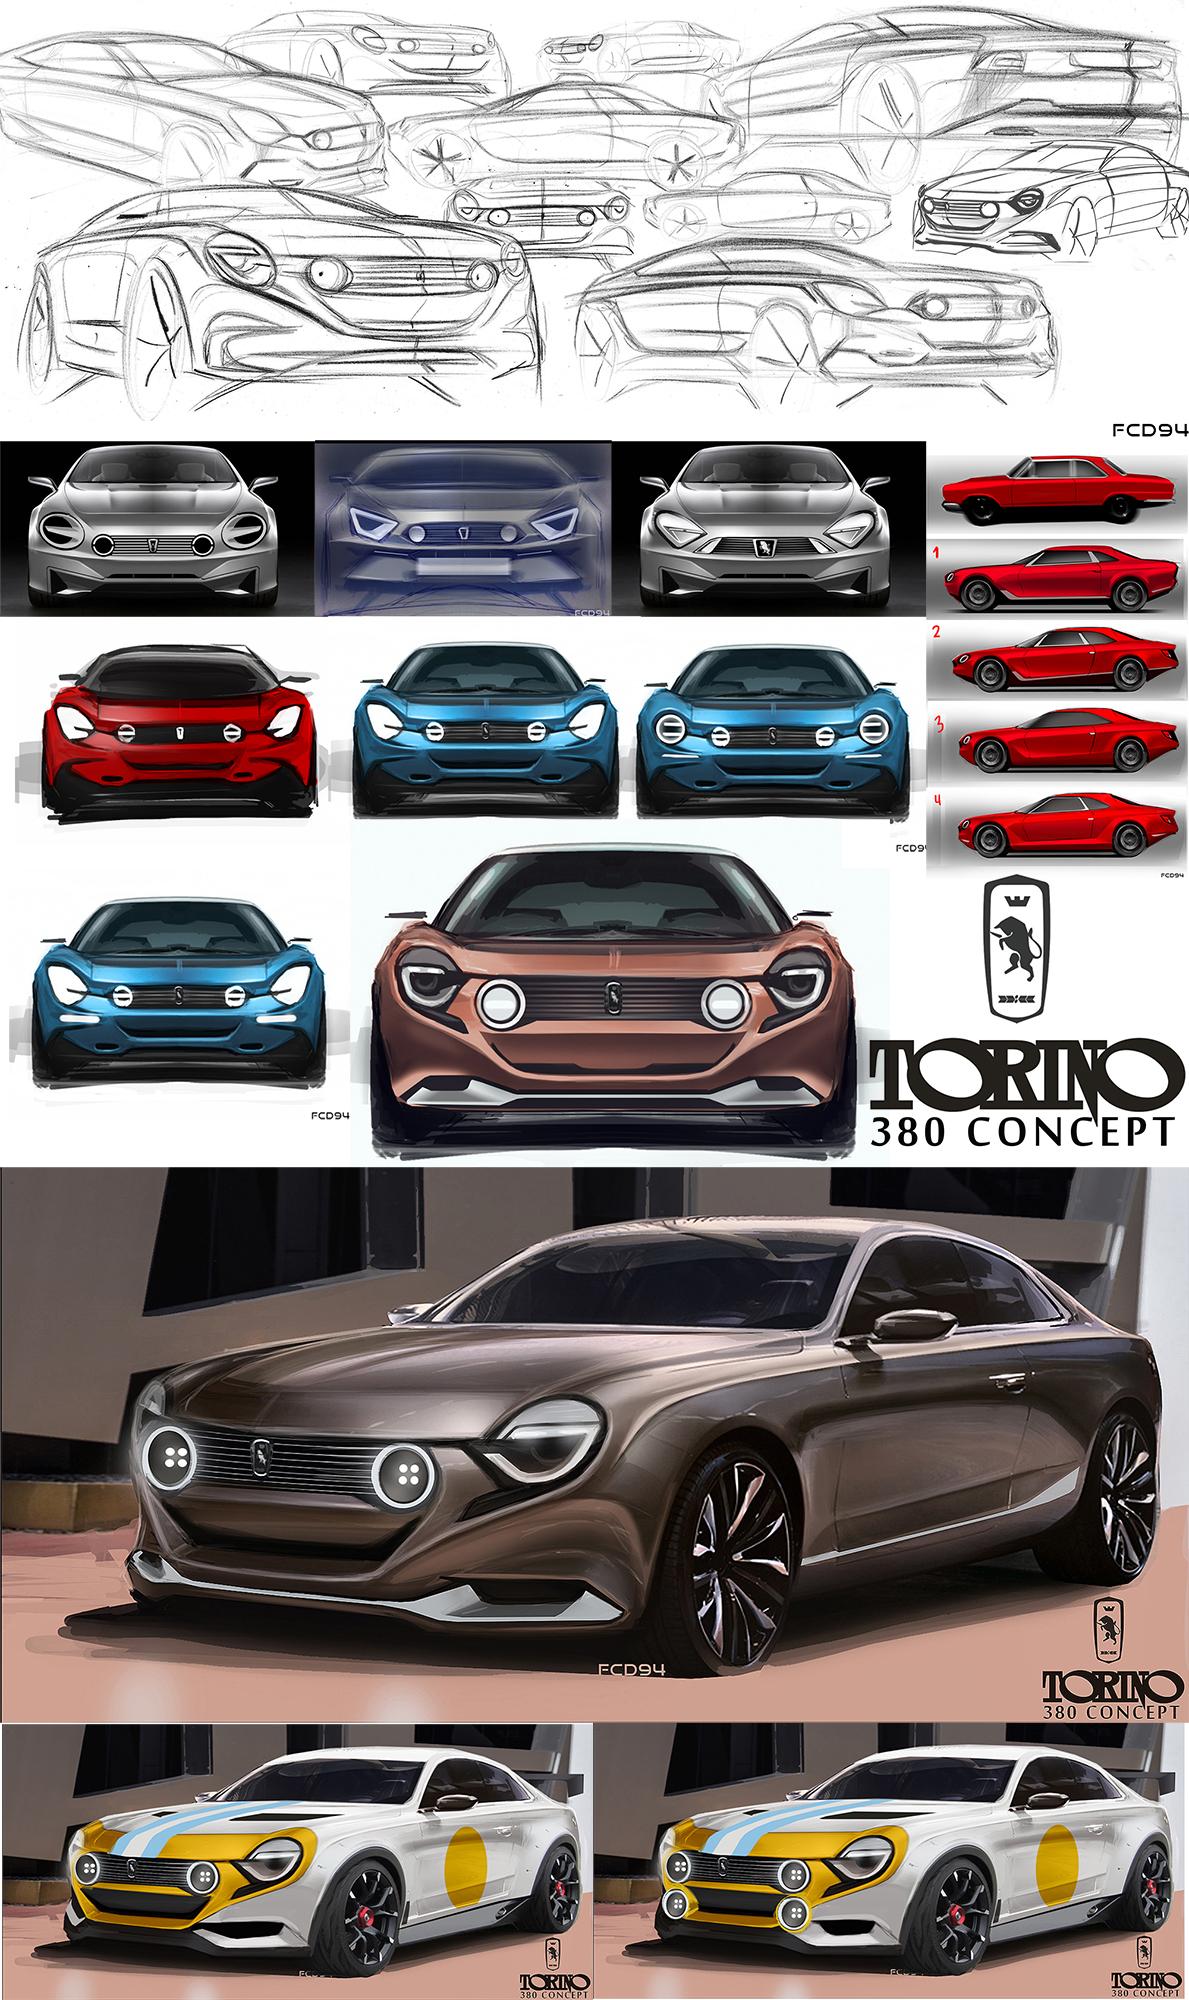 Torino 380 concept proyecto